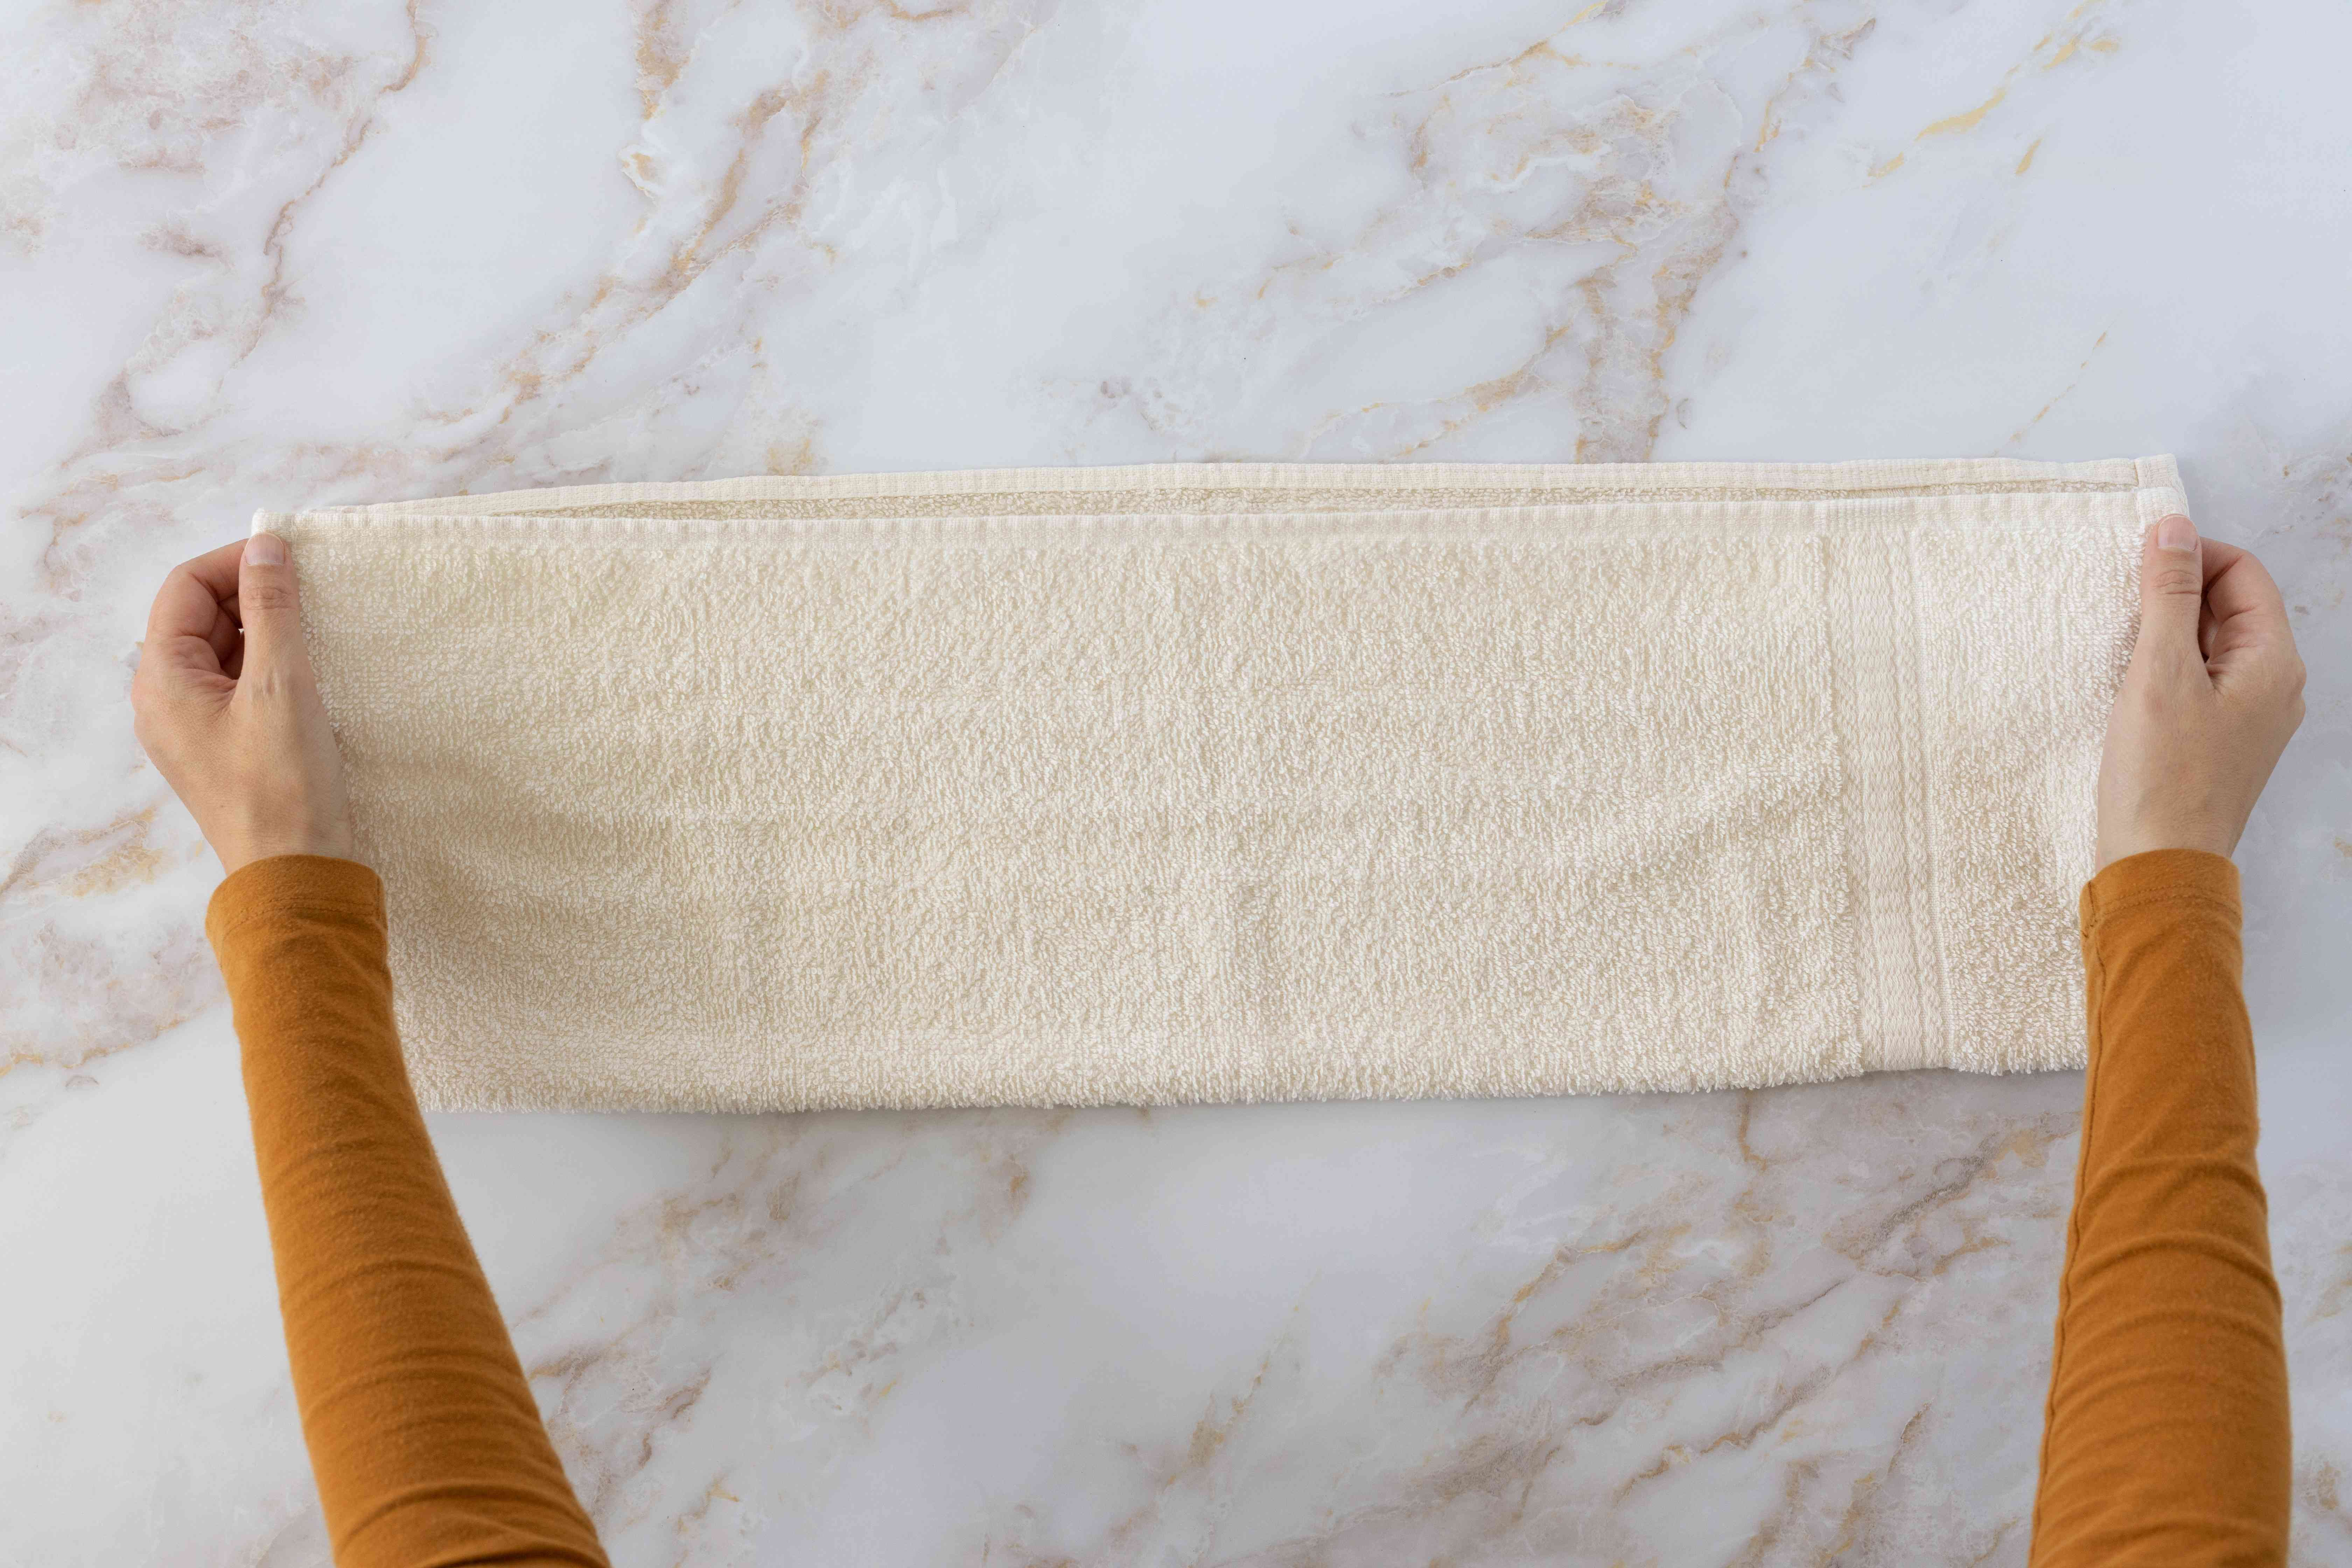 Cream towel folded in half long ways